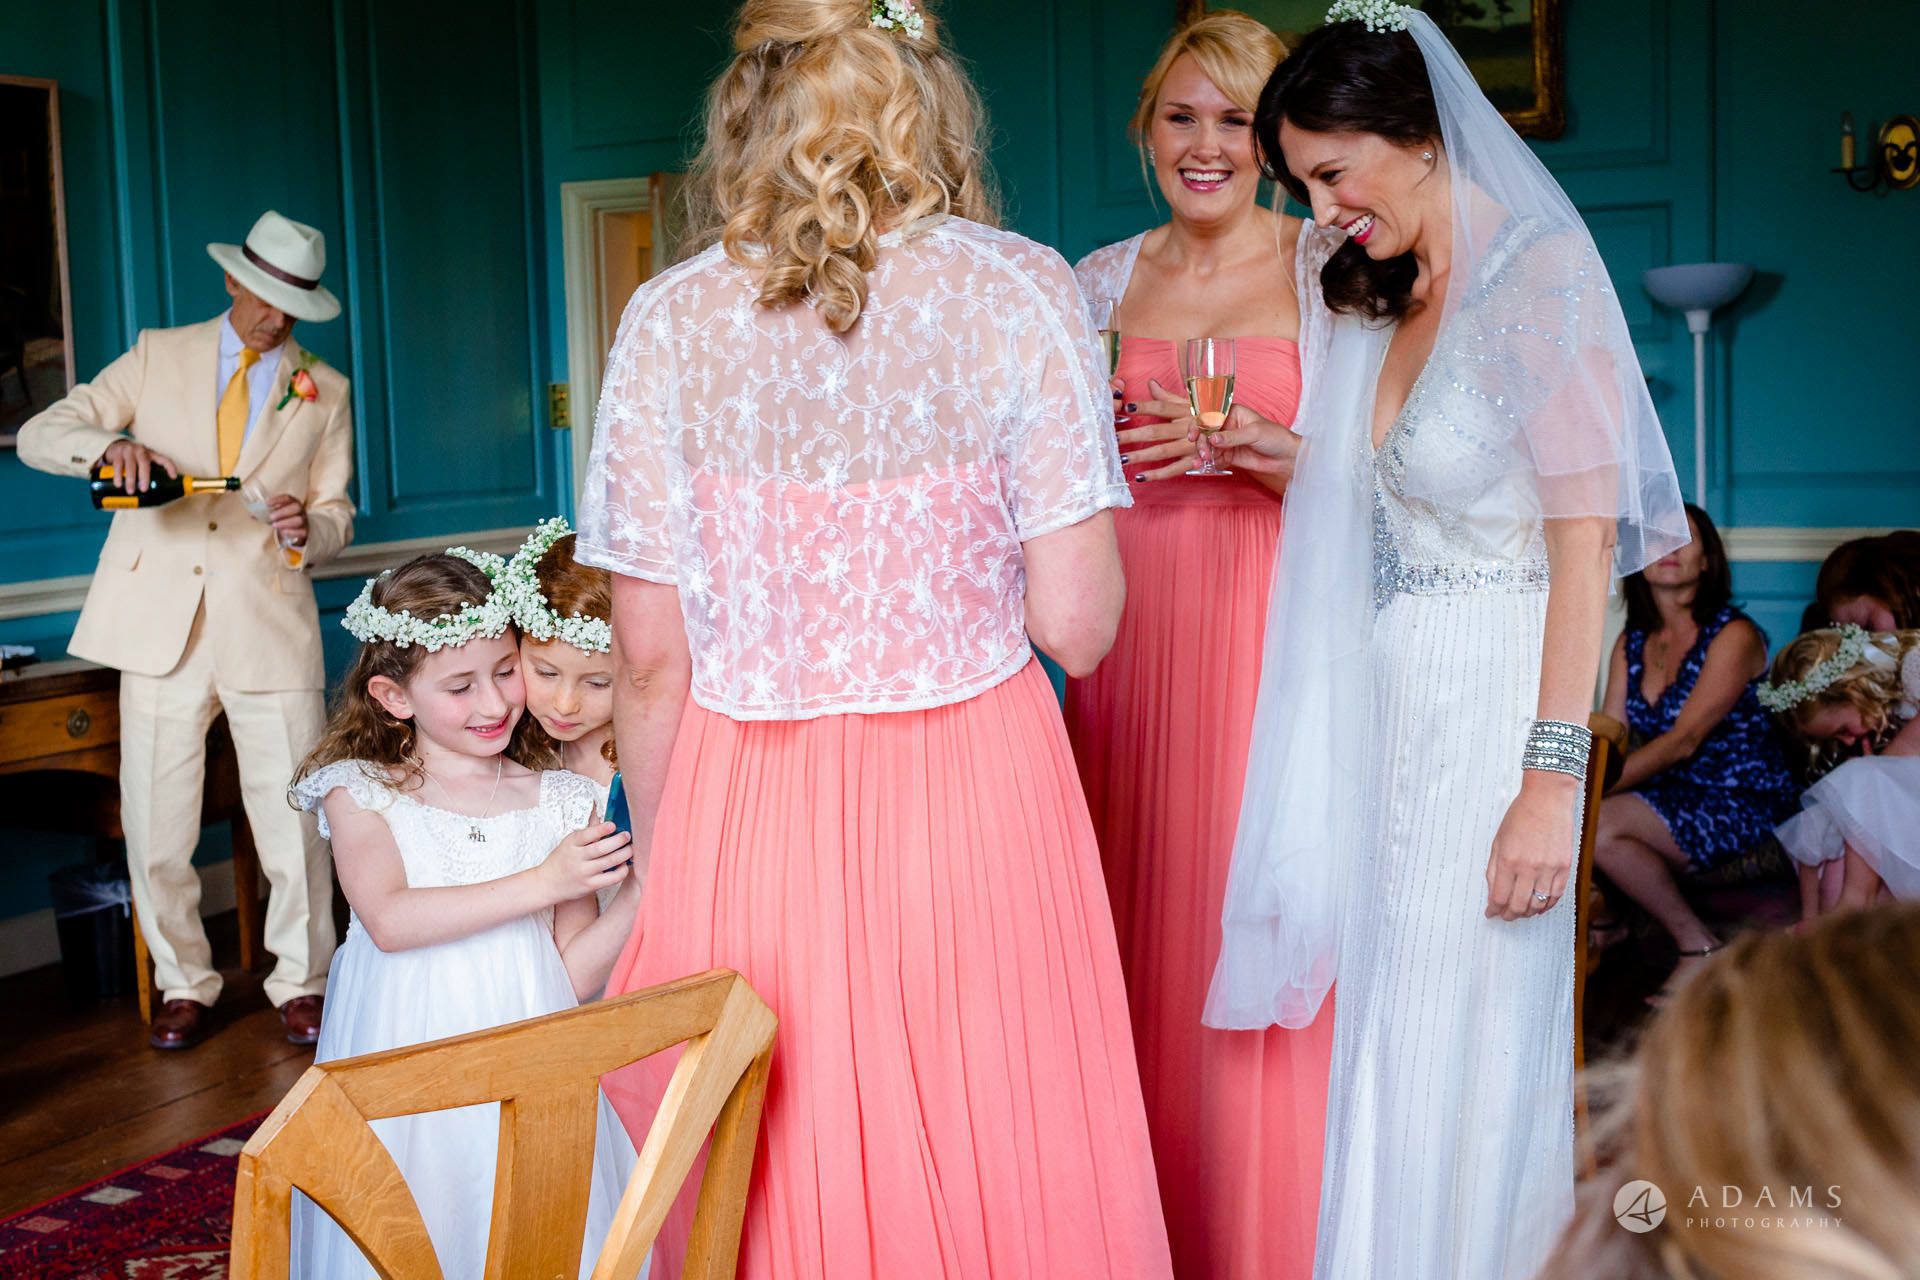 Clare College wedding flower girls playing